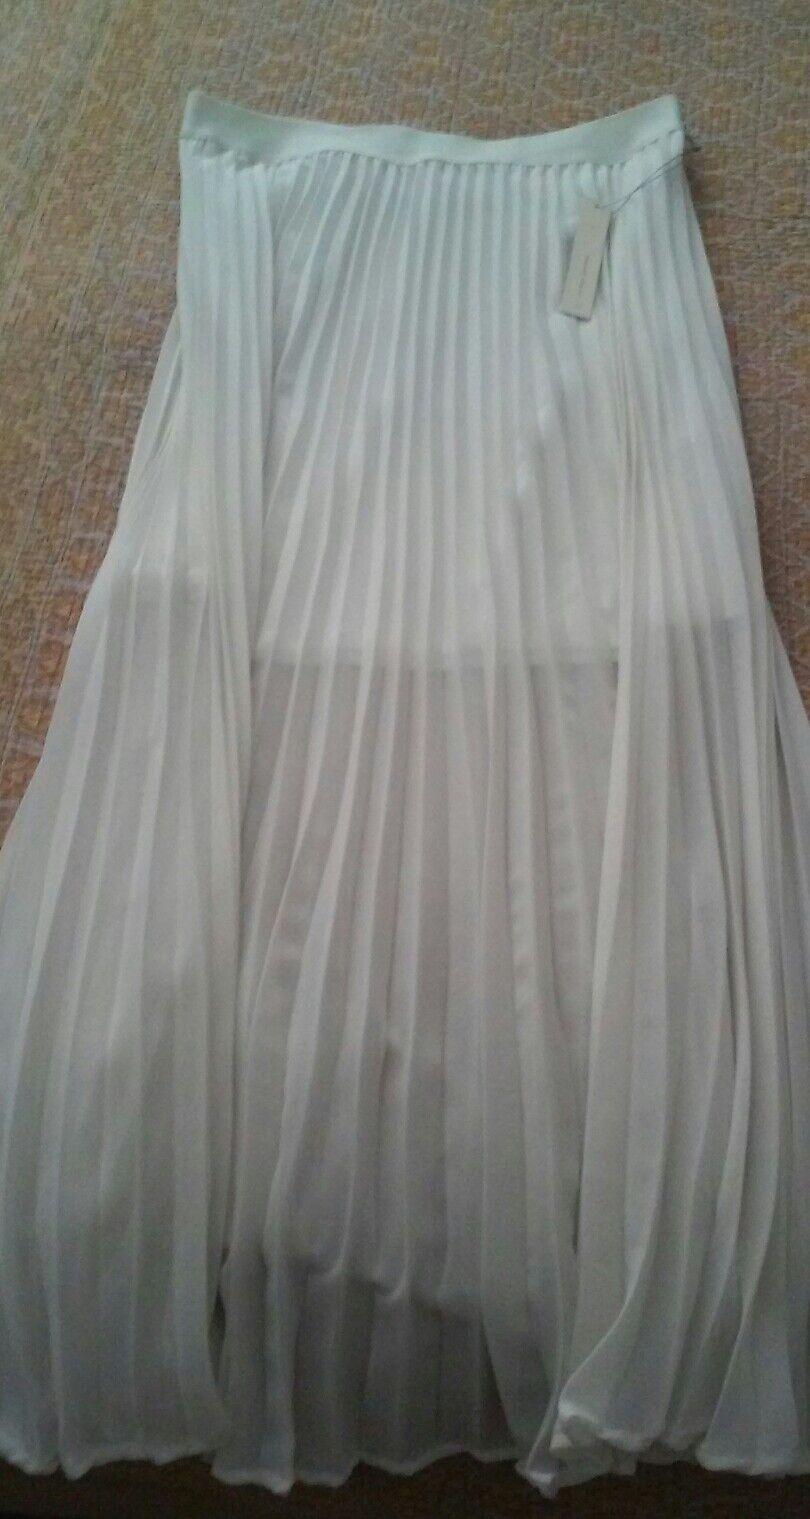 LAUREN CONRAD white garden blooms Collection Skirt S NEW